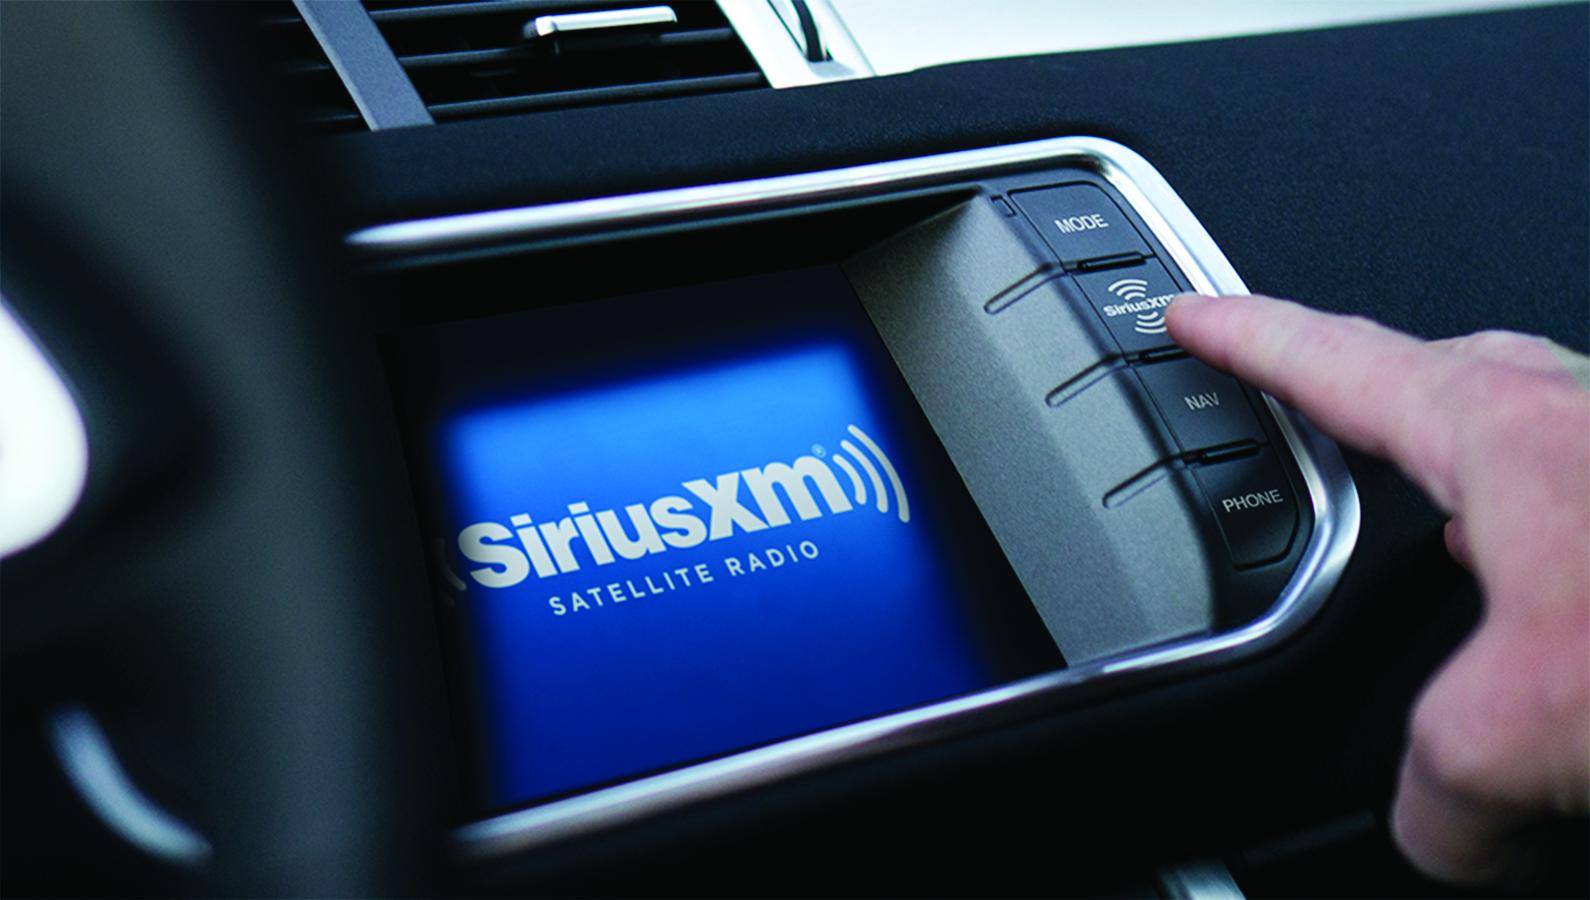 Commercial-free music with SiriusXM Satellite Radio